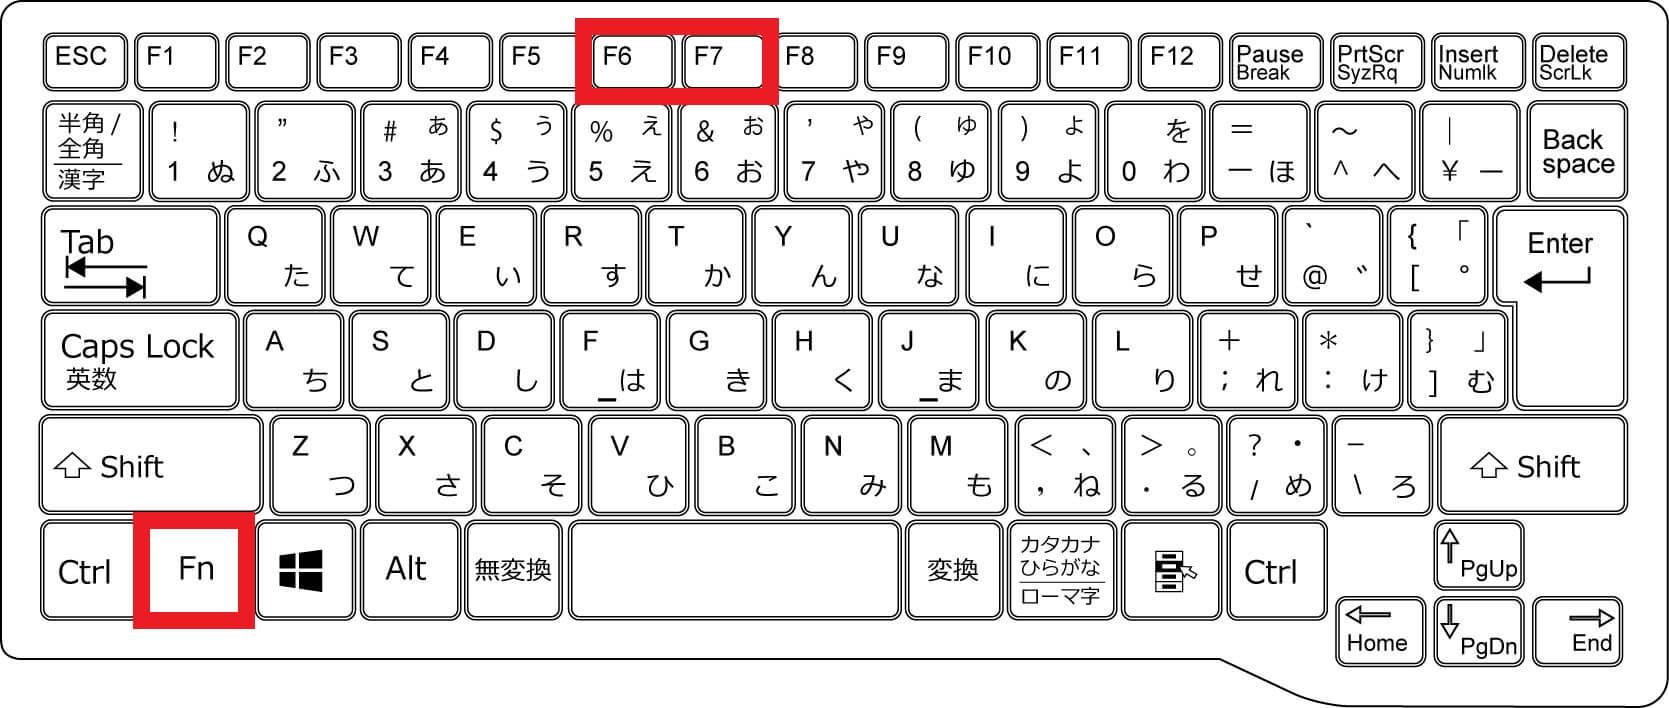 「Fn」キー+「F6」キー/「Fn」キー+「F7」キーの機能